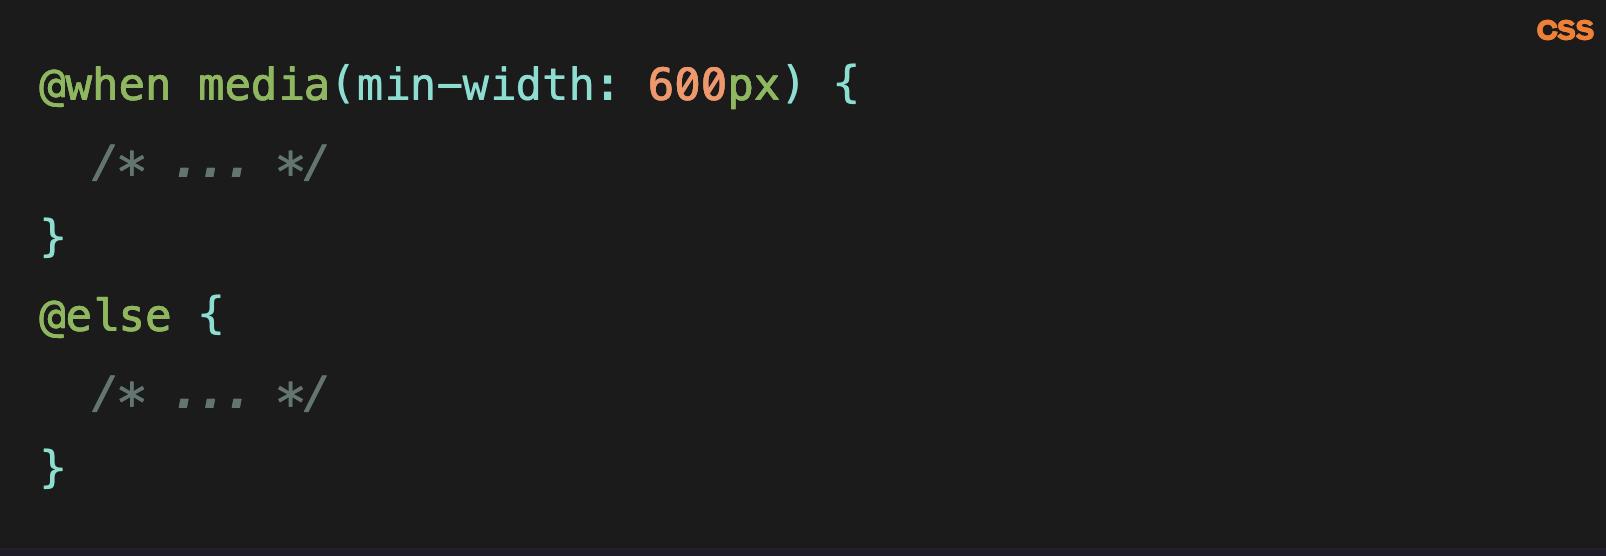 Source code: @when media(min-width: 600px) {   /* ... */  } @else {   /* ... */  }